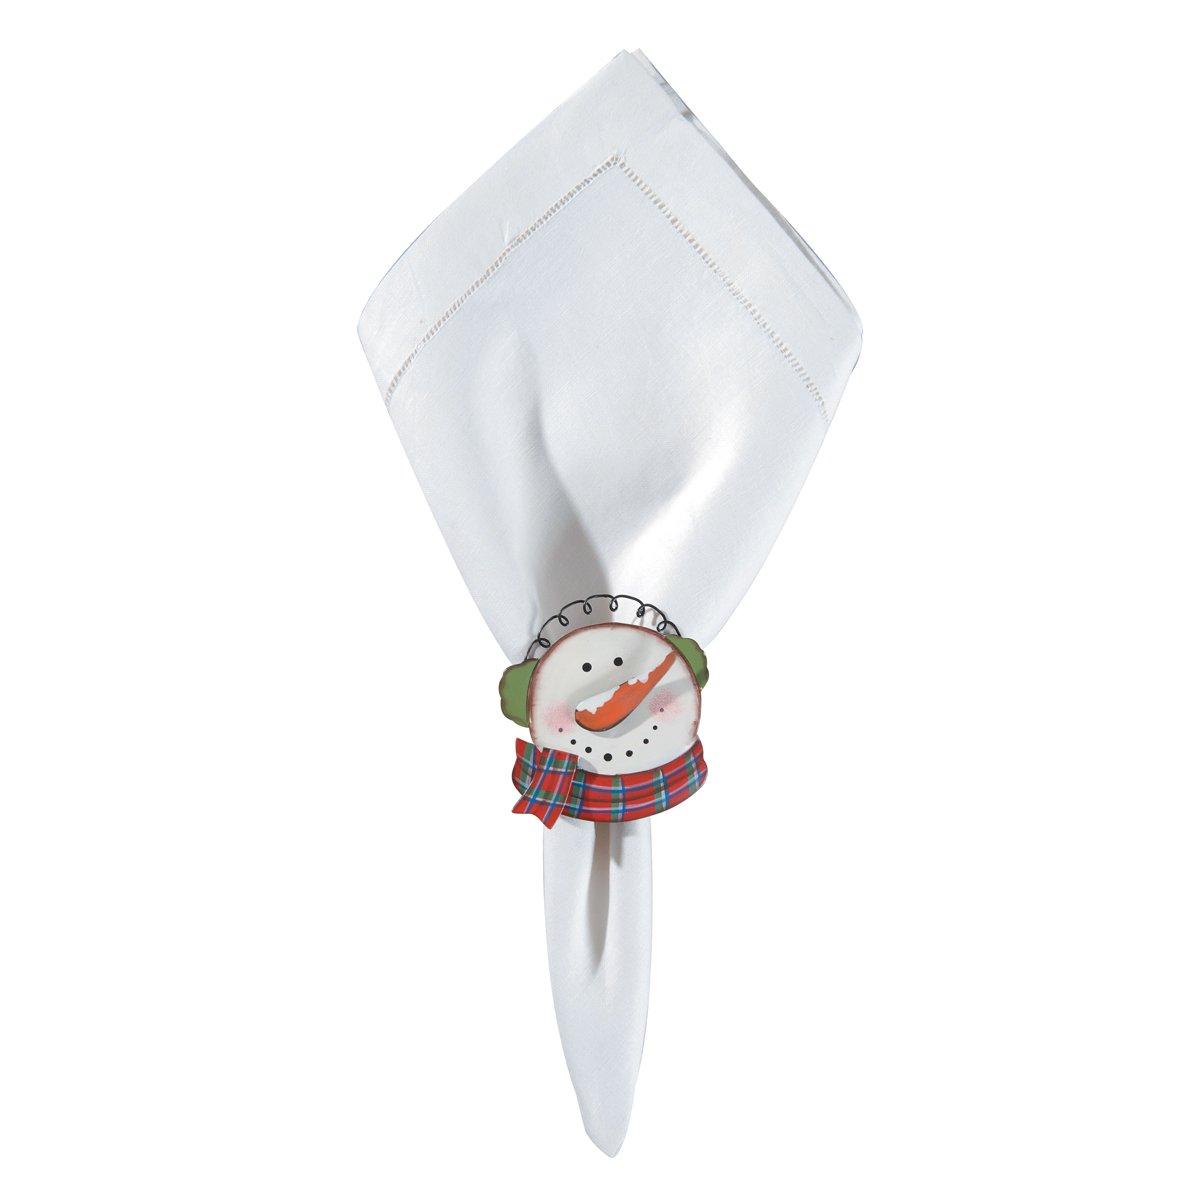 C&F Home Set of 4 Pcs, Earmuff Snowman Christmas Winter Holidays Metal Napkin Ring